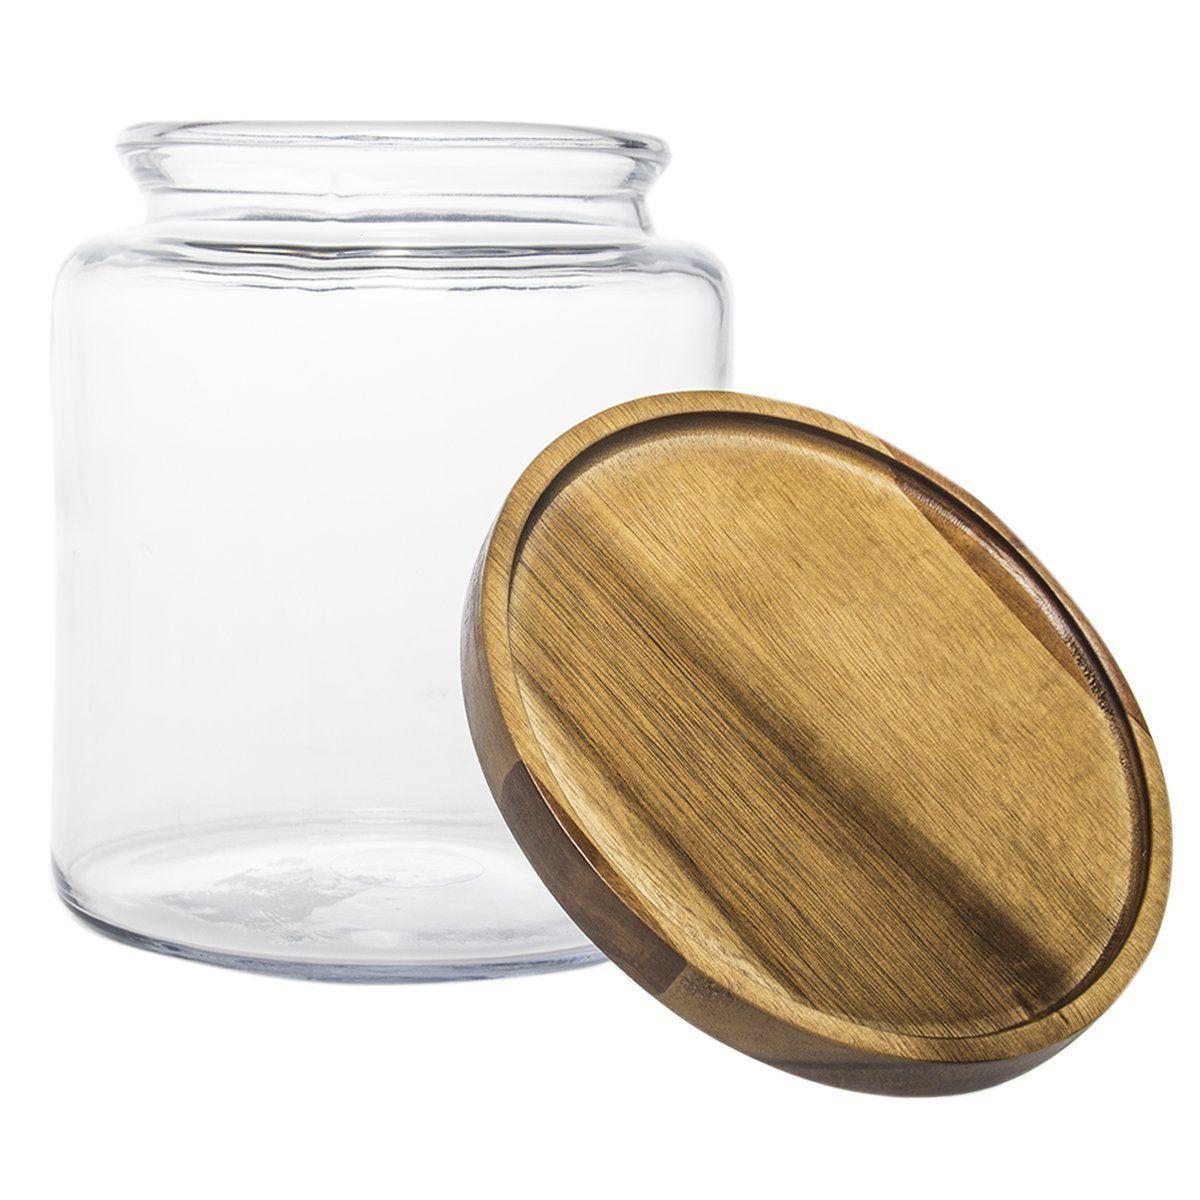 Amazon.com: Anchor Hocking (2 Pack) 96oz Clear Glass Storage Jars ...